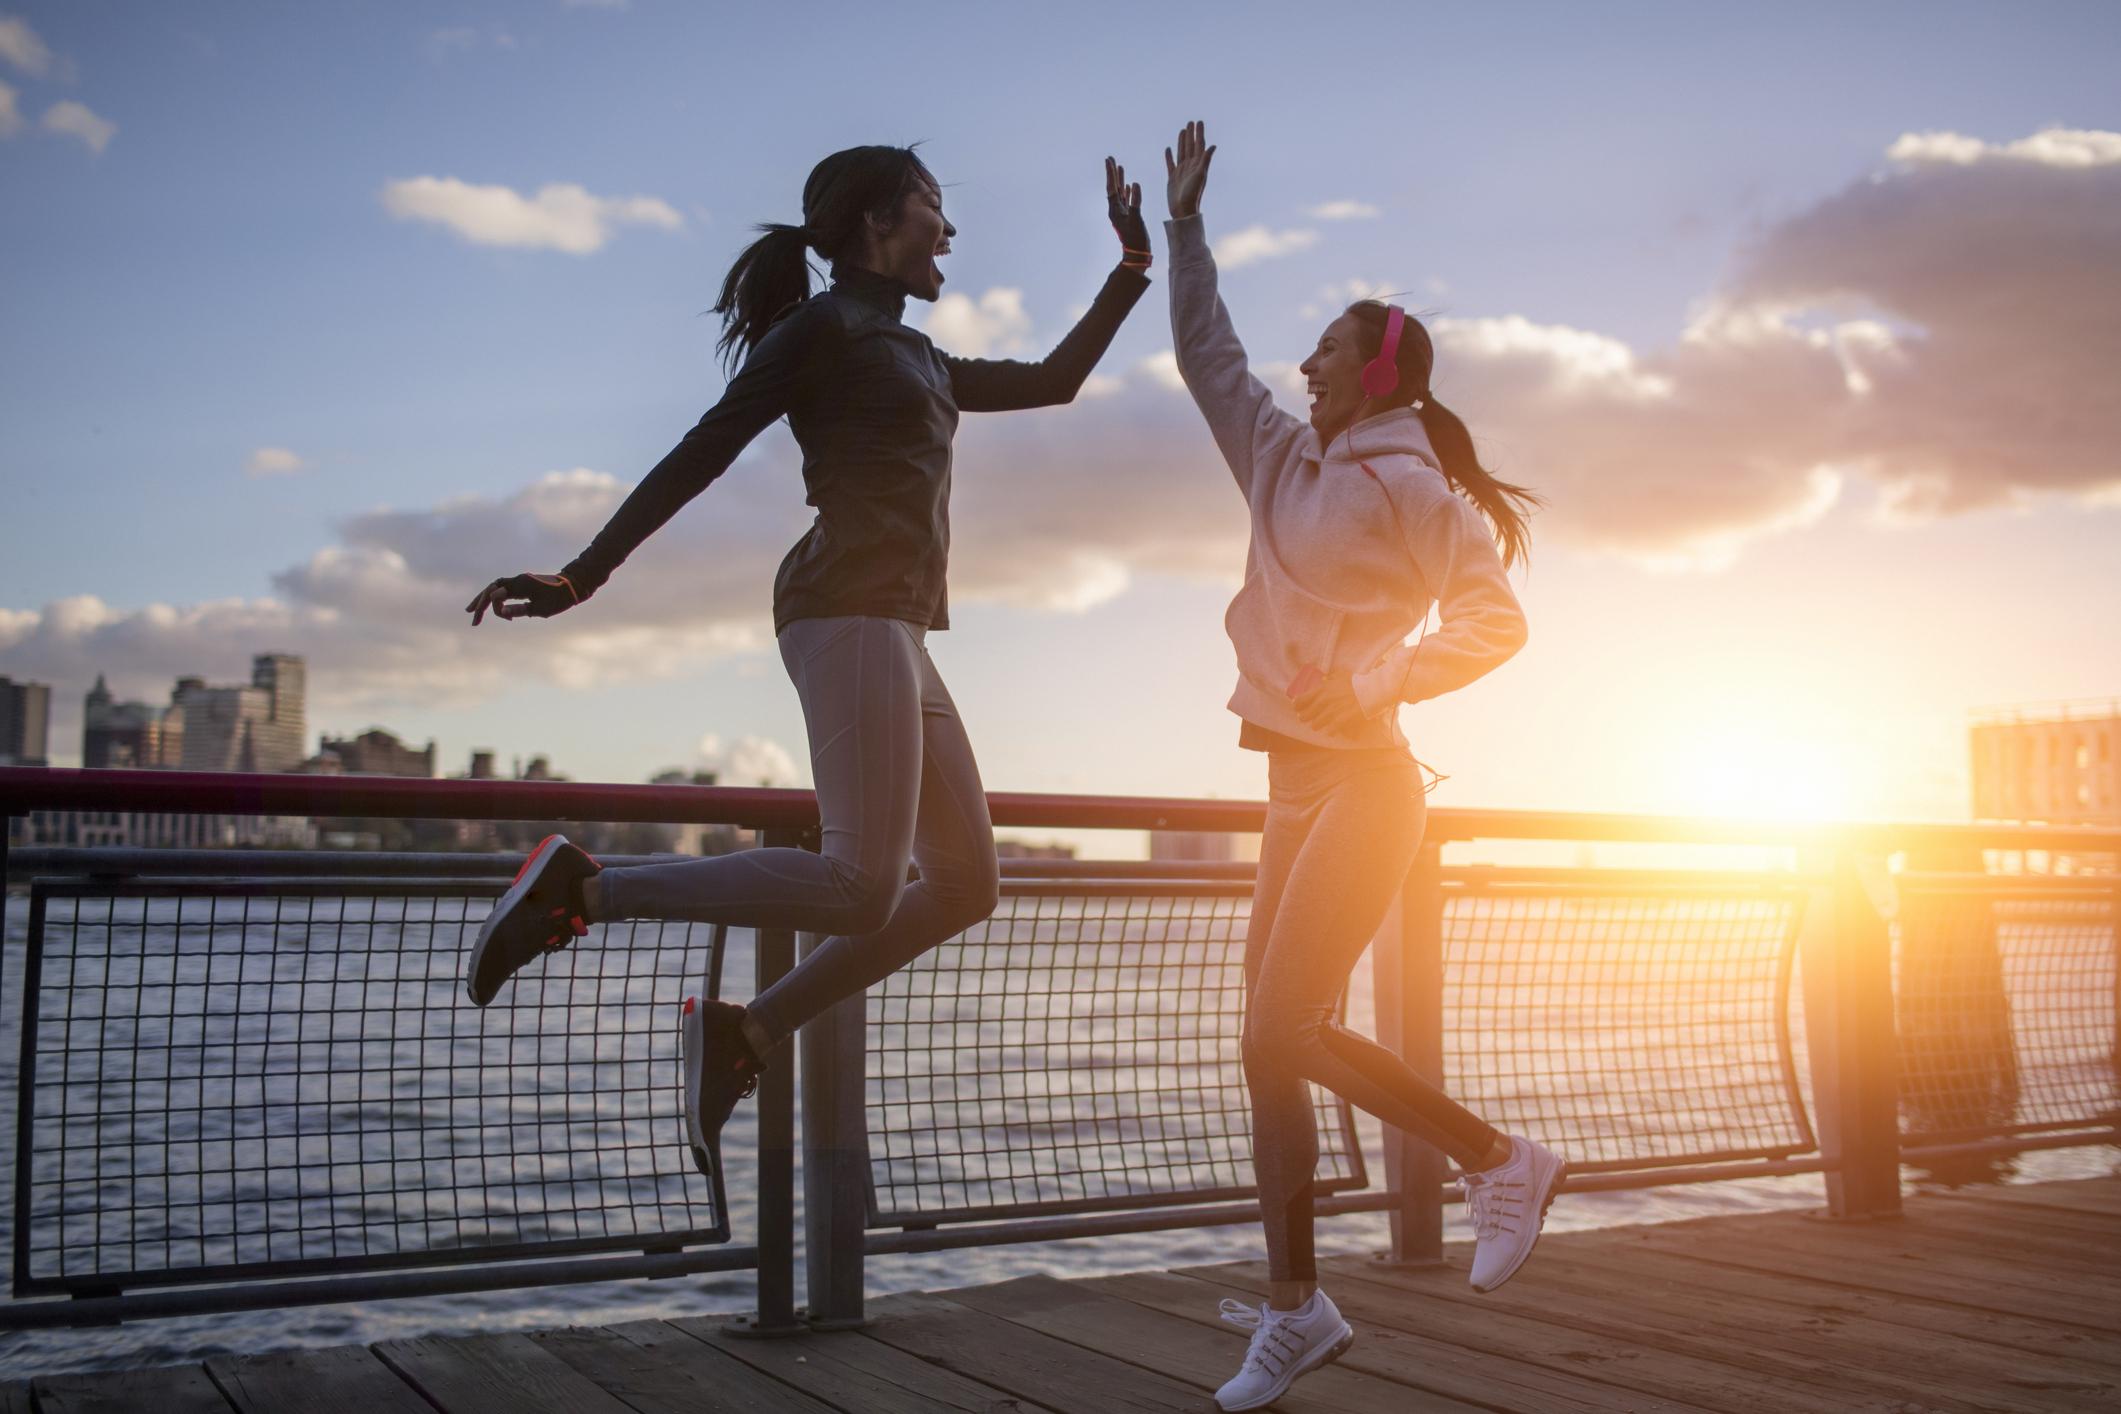 Sport, Bewegung, Motivation, Sportmotivation, basische Ernährung, tribalance, Frühling, schönes Wetter